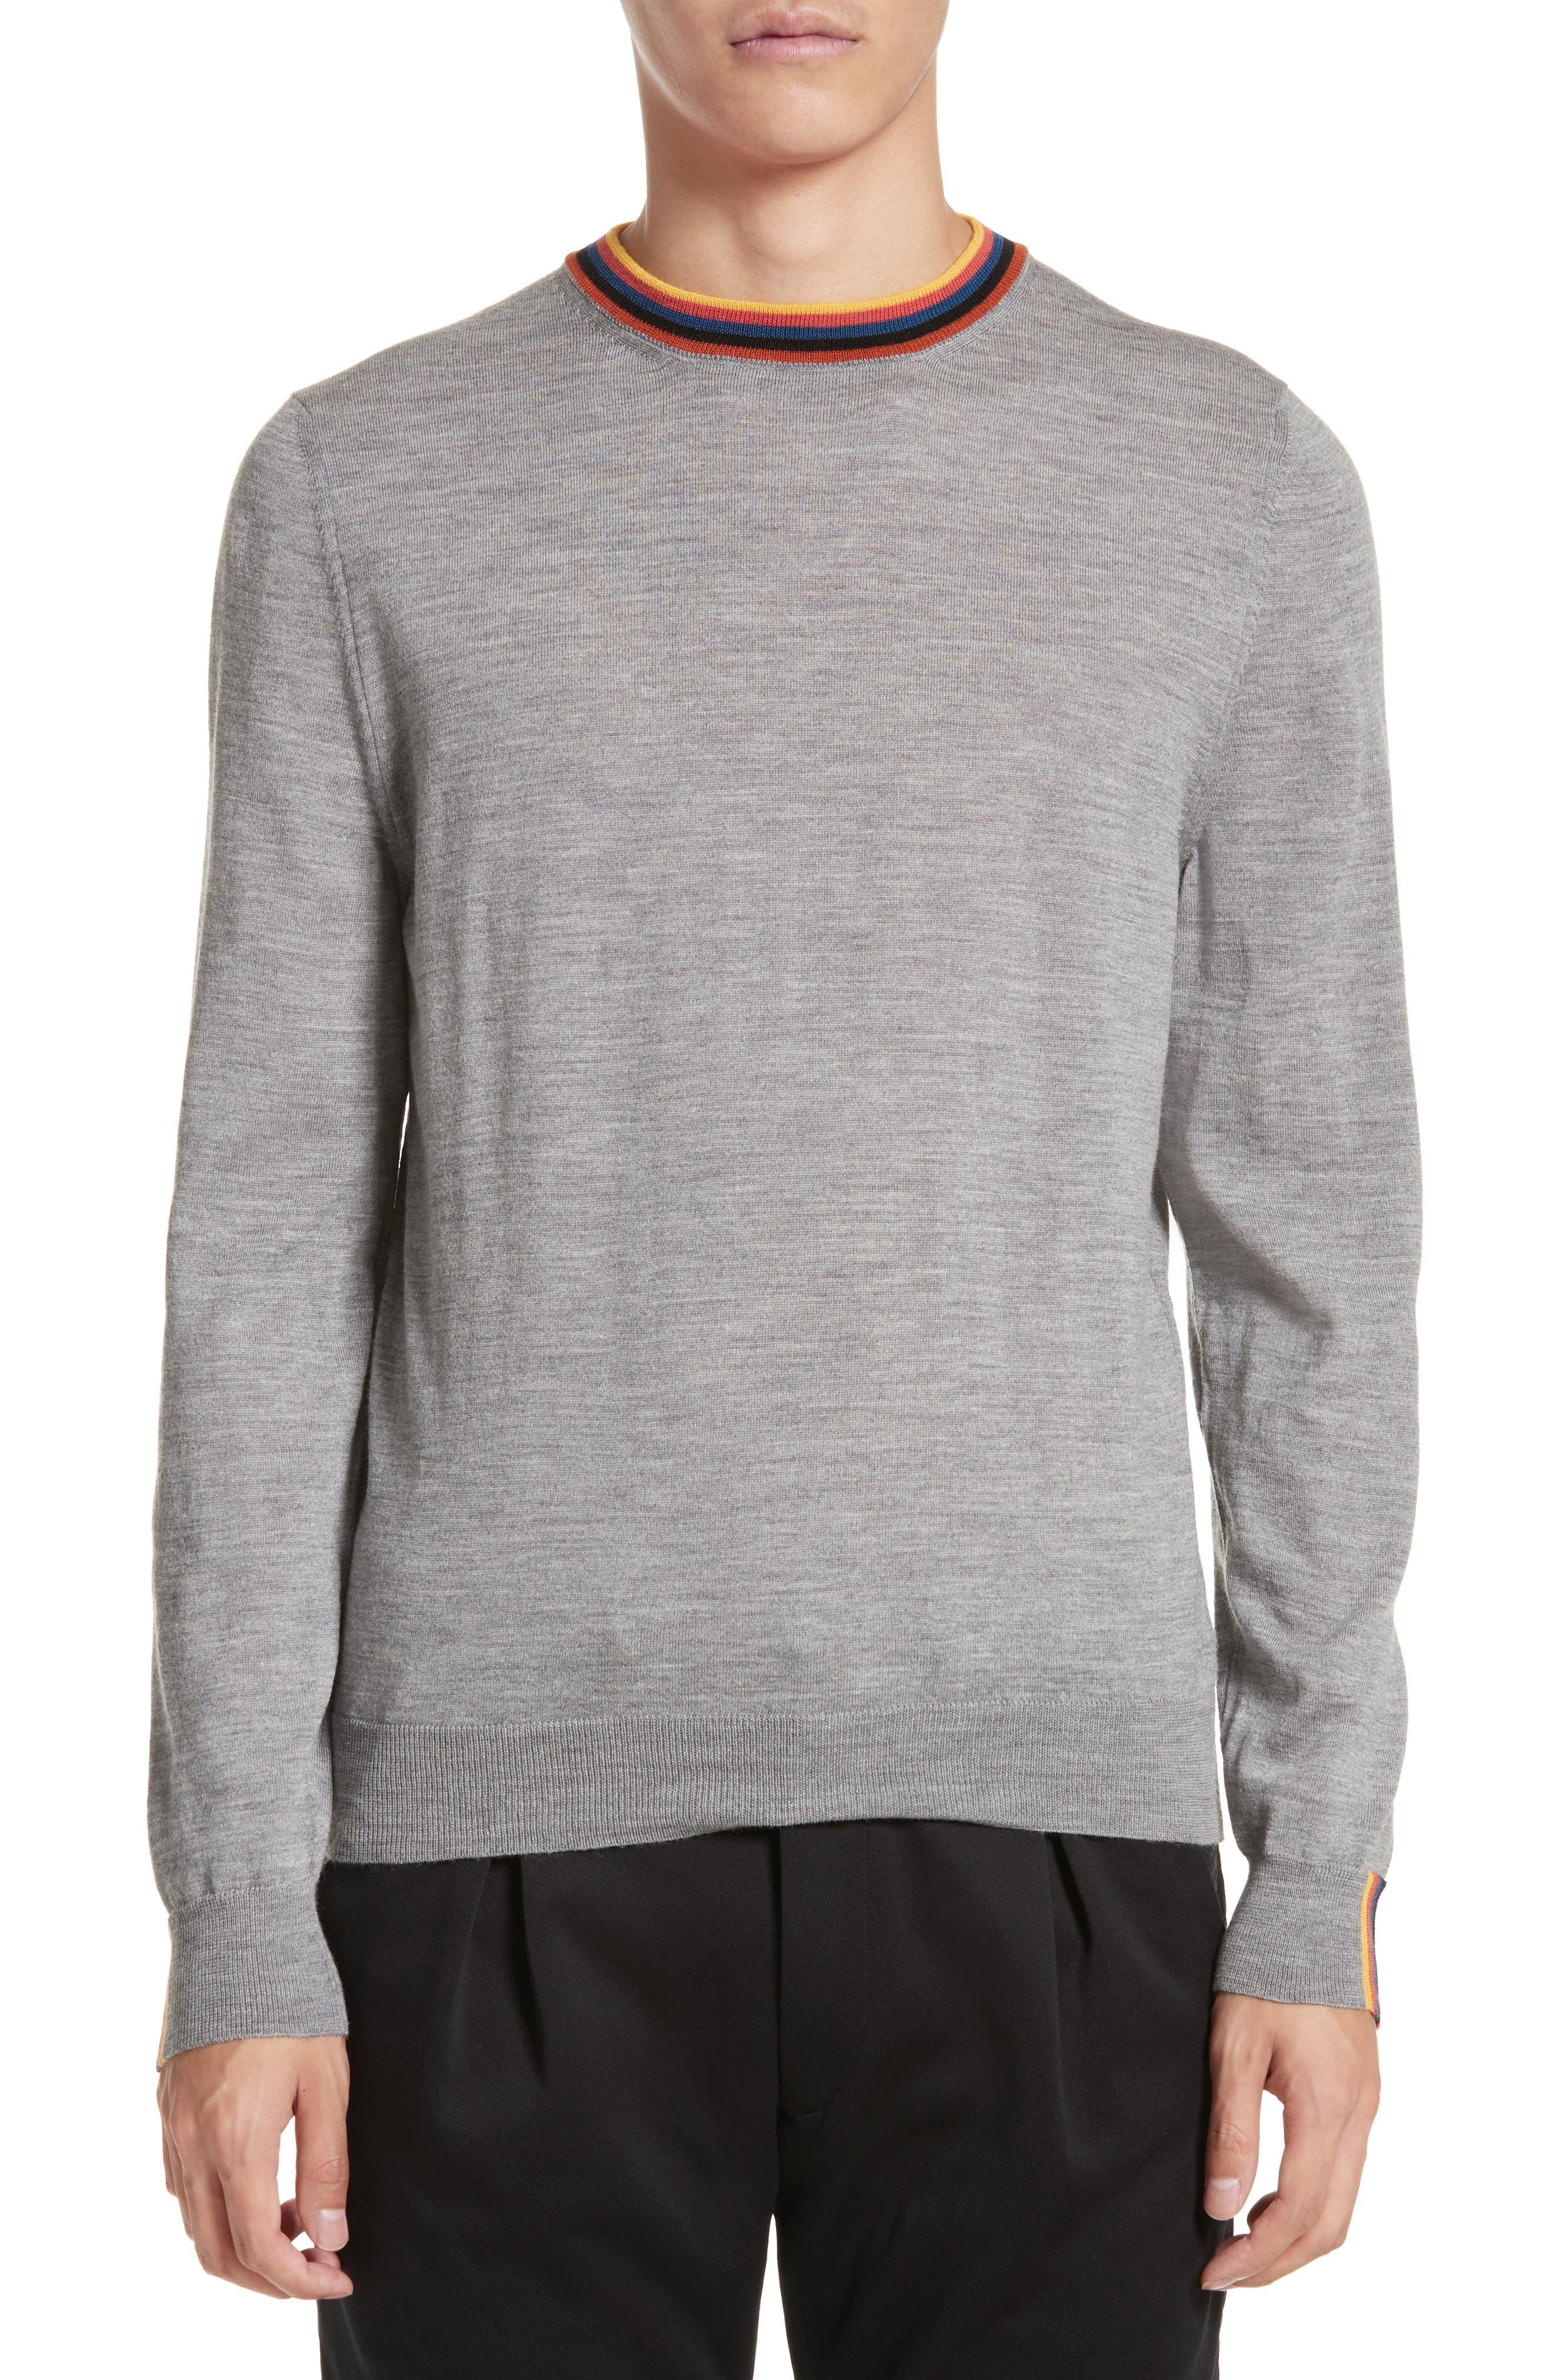 Artist Stripe Merino Wool Sweater,                         Main,                         color, 020